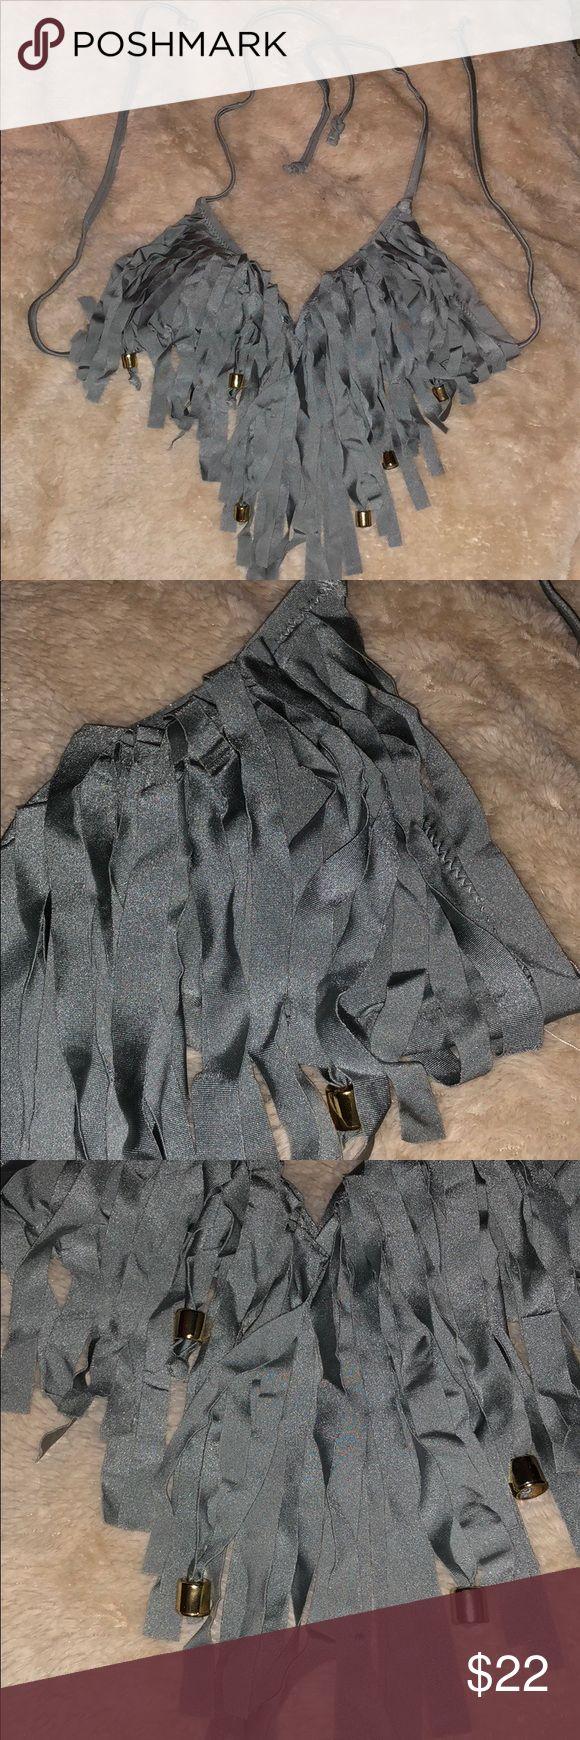 Gray Fringed Triangle Bikini Top w/Gold Beads No brand tag. Australian size 10. Good condition see photos. Removable pads. Swim Bikinis